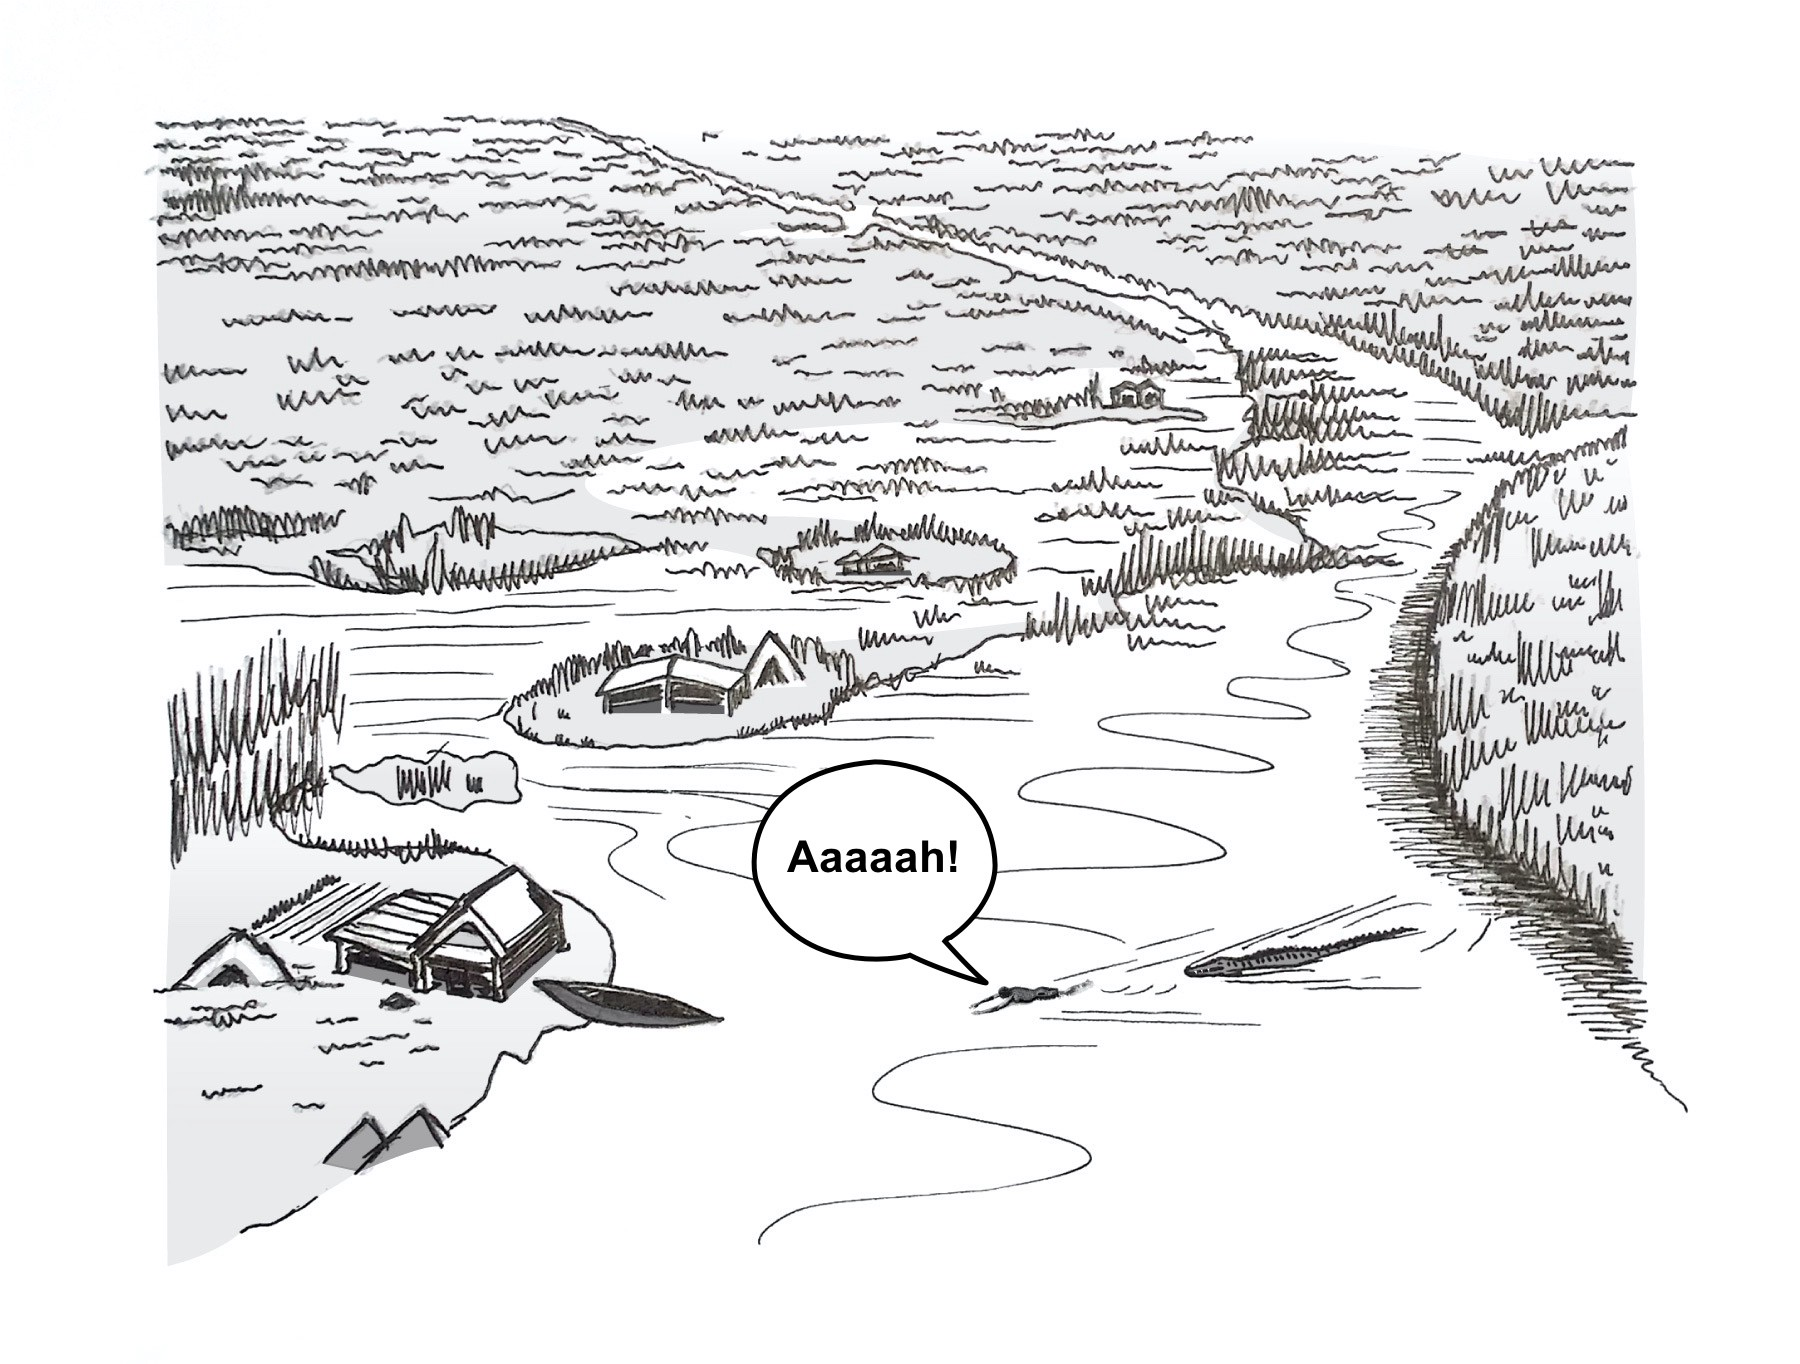 River scene with a crocodile chasing a man